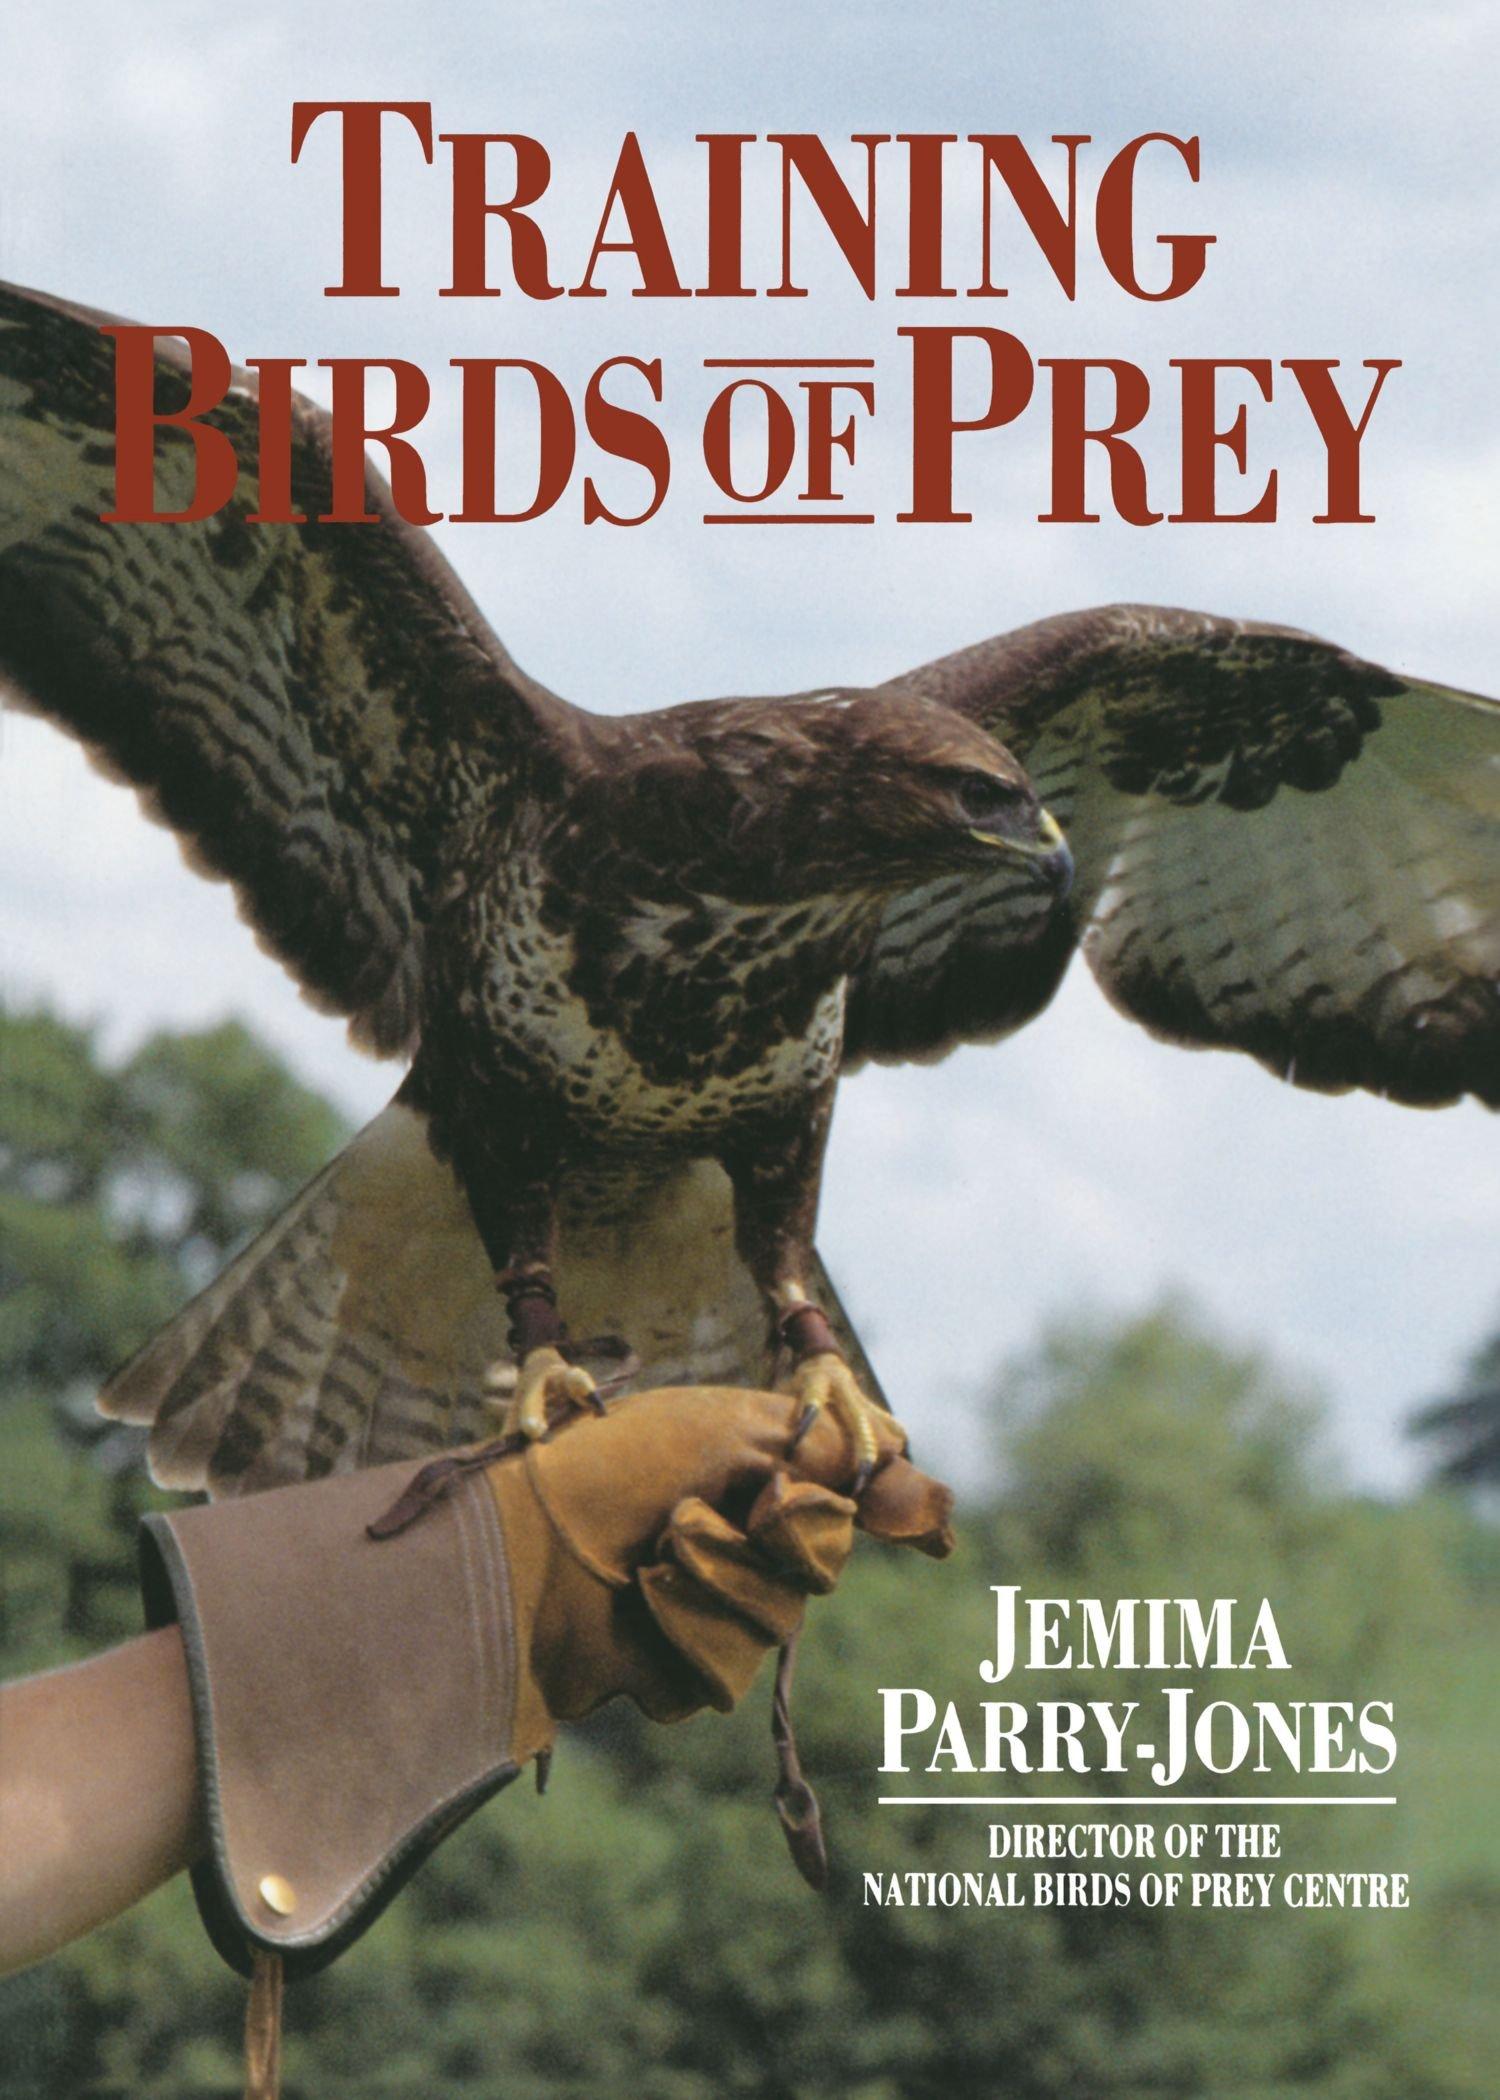 Training Birds of Prey: Jemima Parry-Jones: 9780715312384: Amazon.com: Books